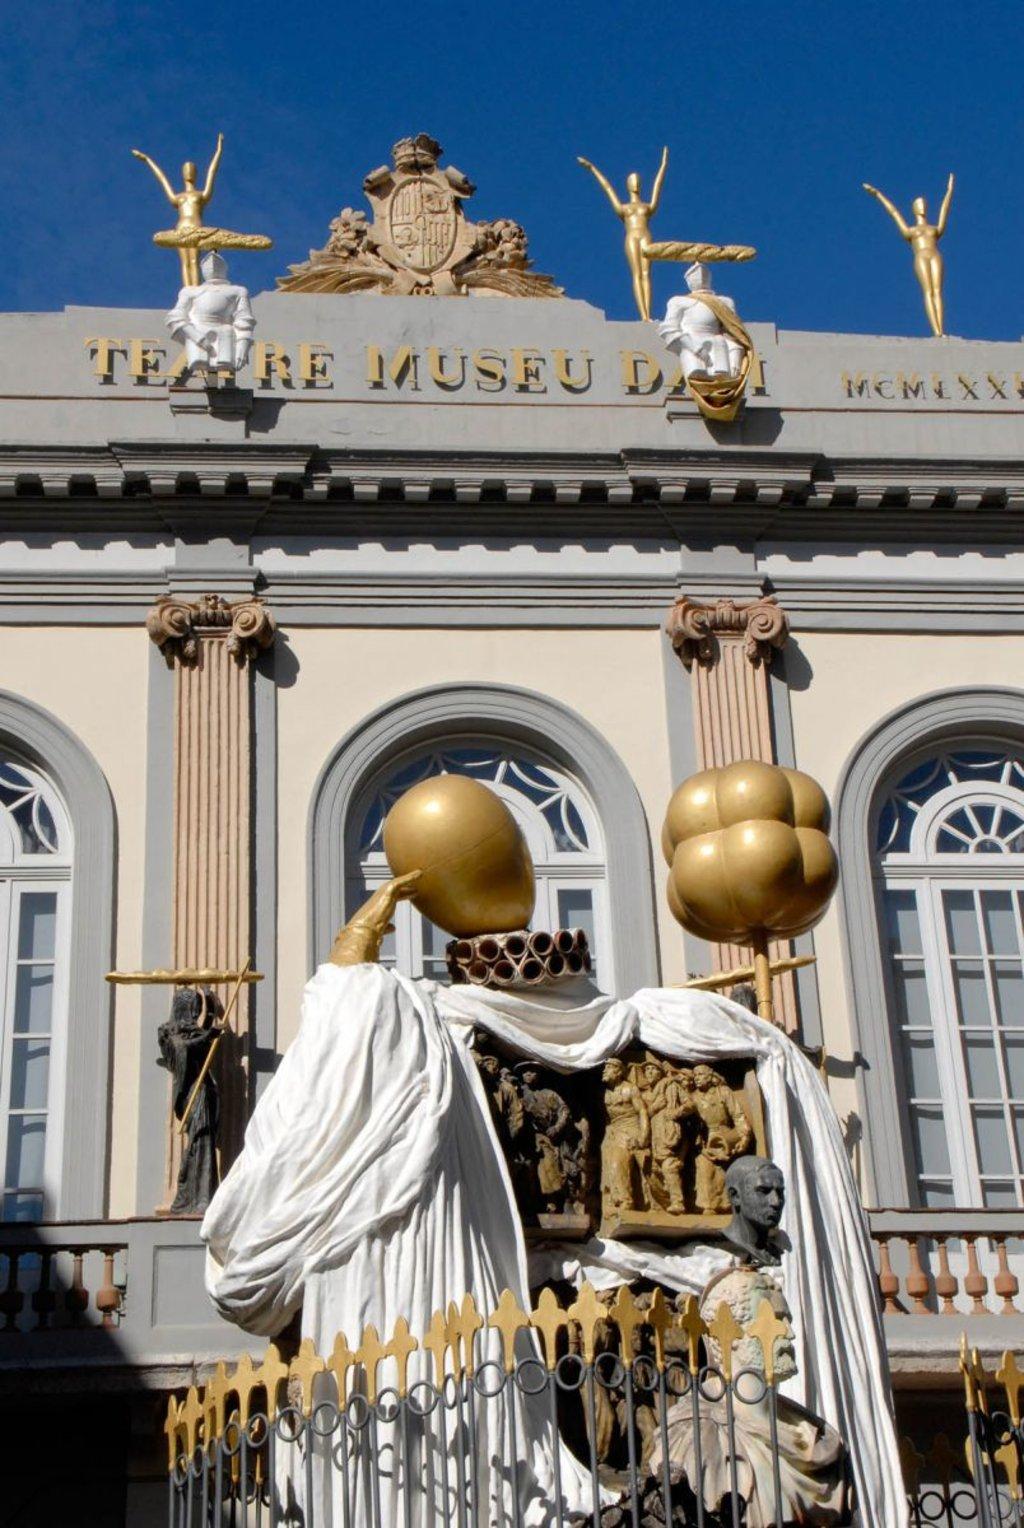 Facciata del Teatro-Museo di Dalí a Figueres (courtesy of Gala-Salvador Dalí Foundation ©Fundació Gala-Salvador Dalí, 2014)